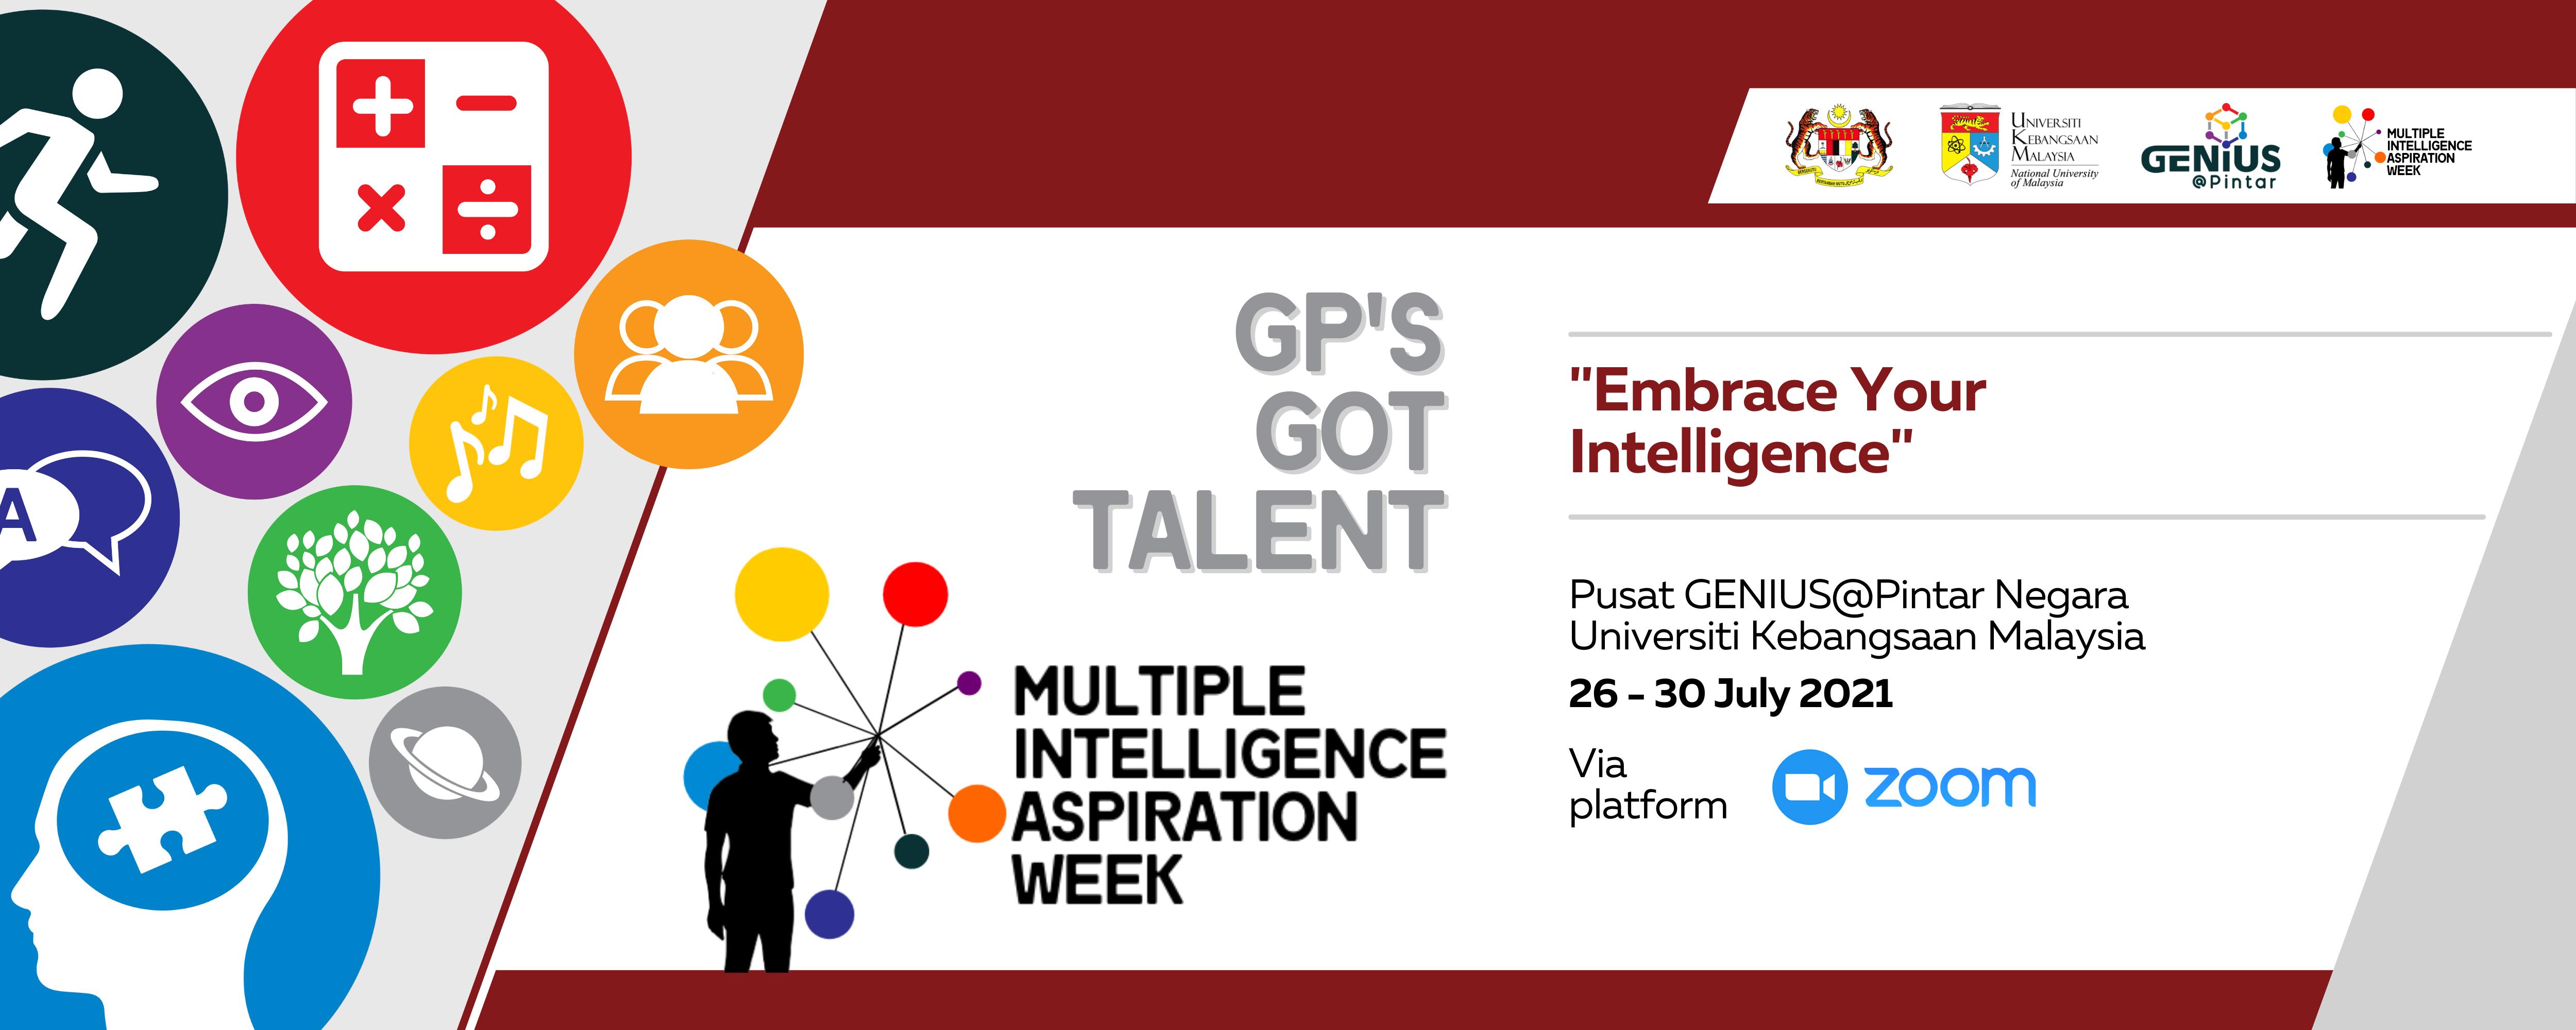 Multiple Intelligence Aspiration Week 2021